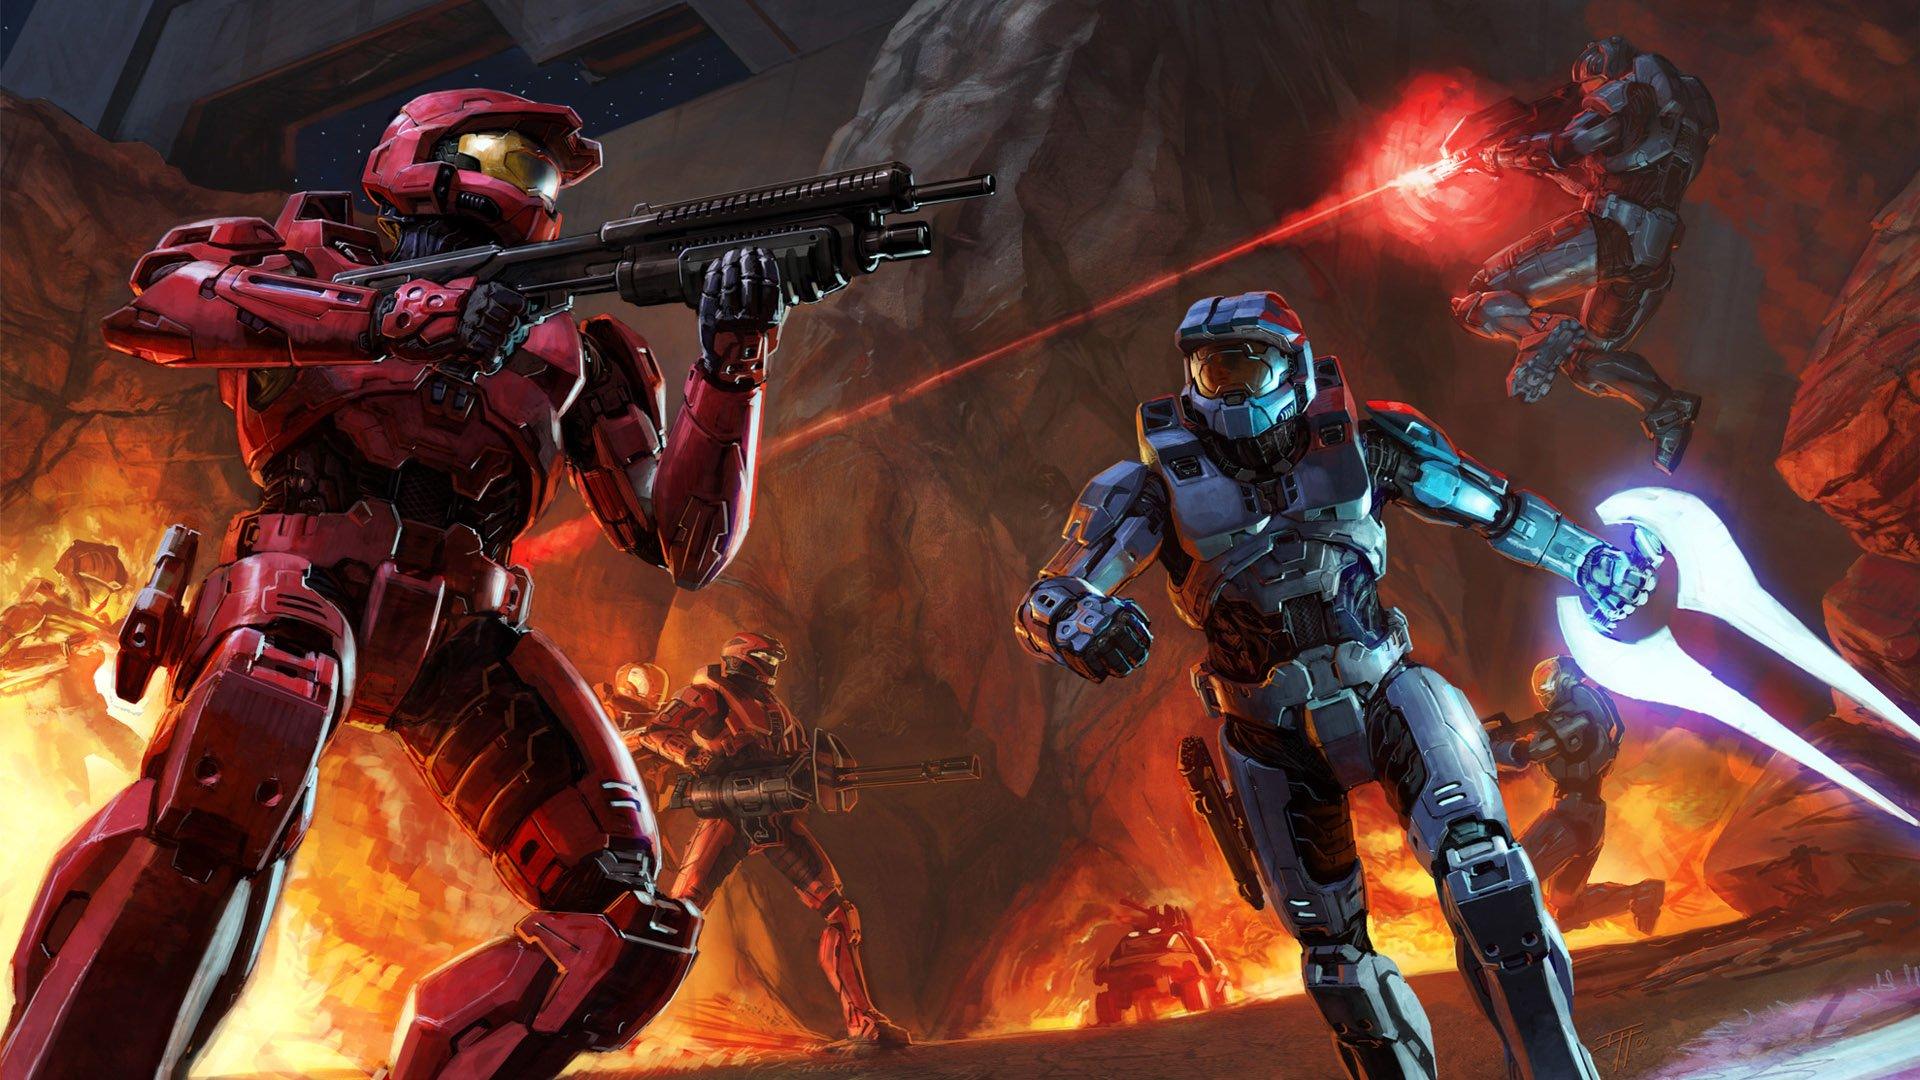 Halo 2 HD Wallpaper | Background Image | 1920x1080 | ID ...